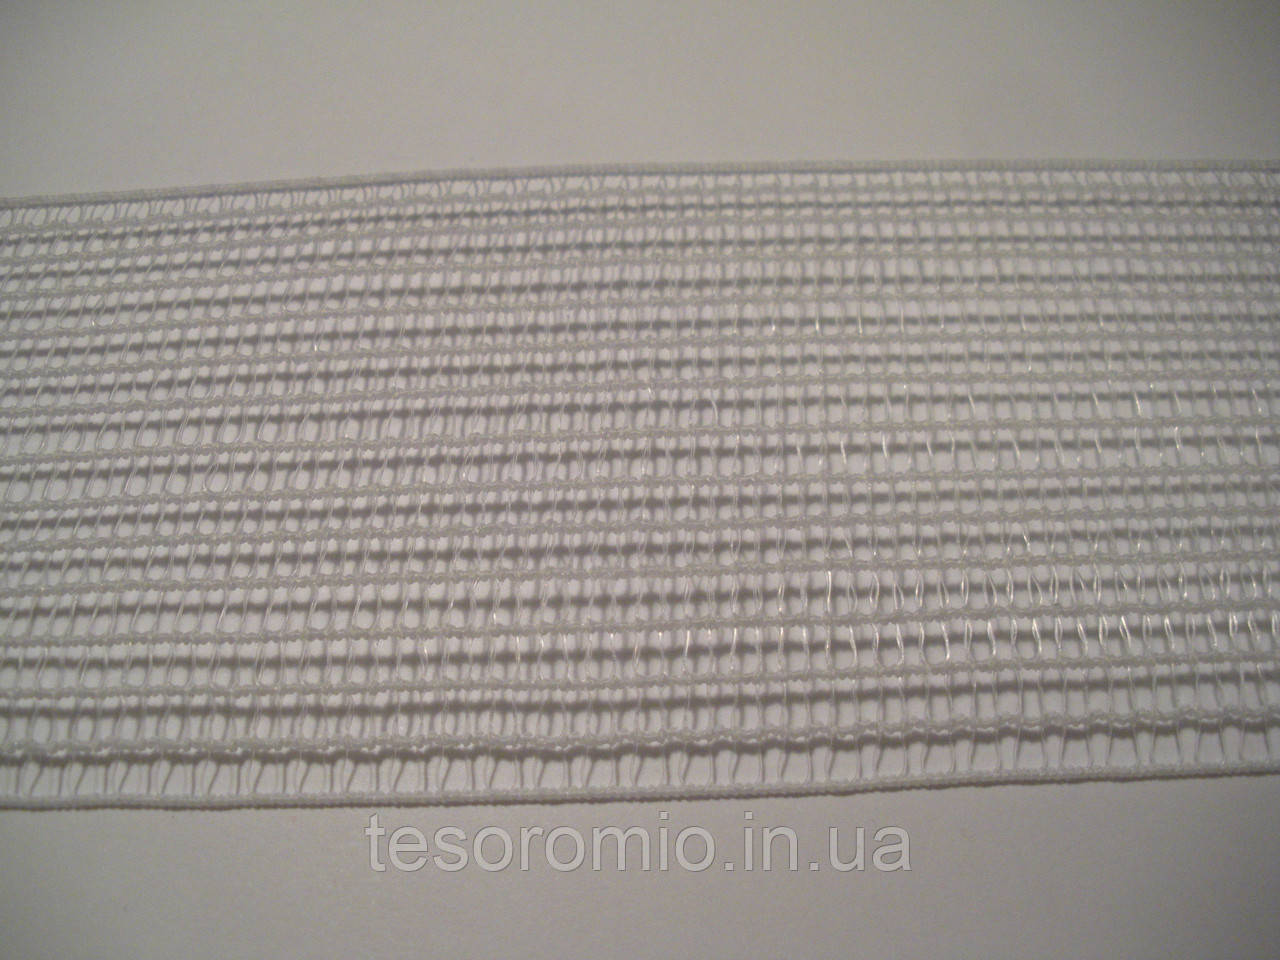 Резинка сетка белая 4,3 мм ширина